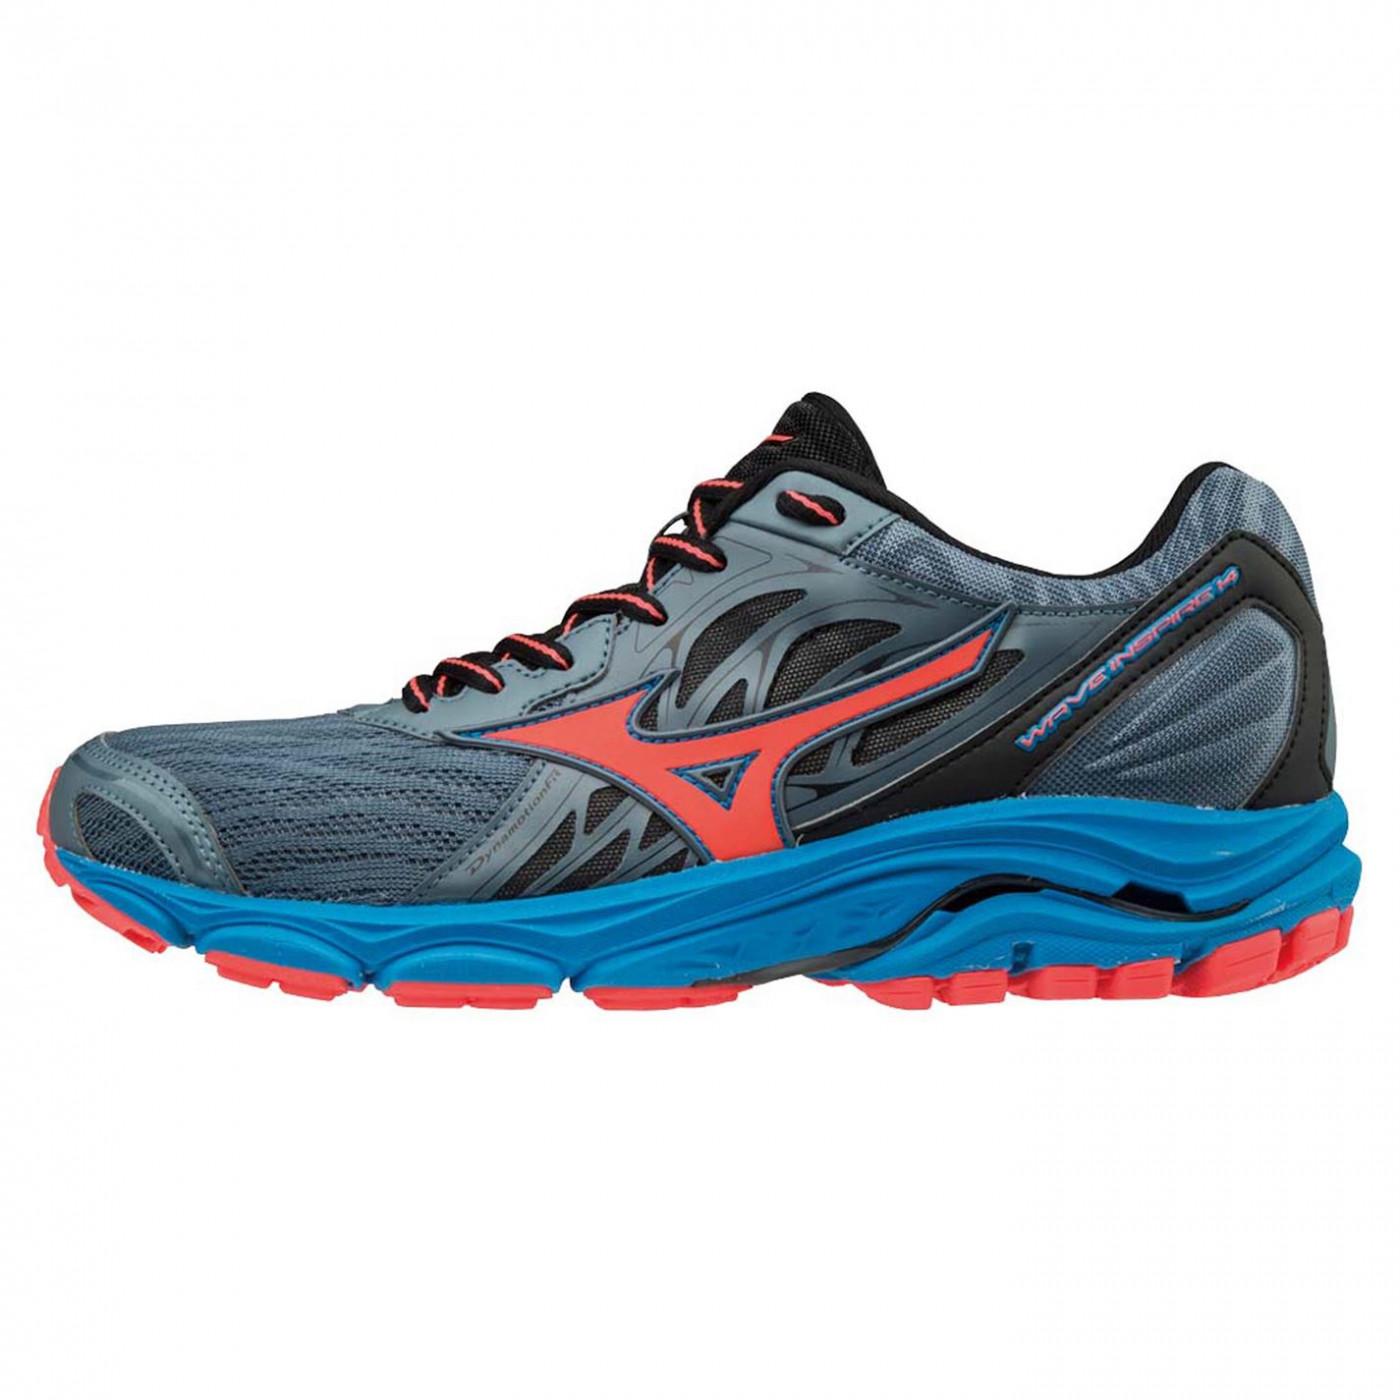 caefe75516 Mizuno Wave Inspire 14 Ladies Running Shoes - FACTCOOL